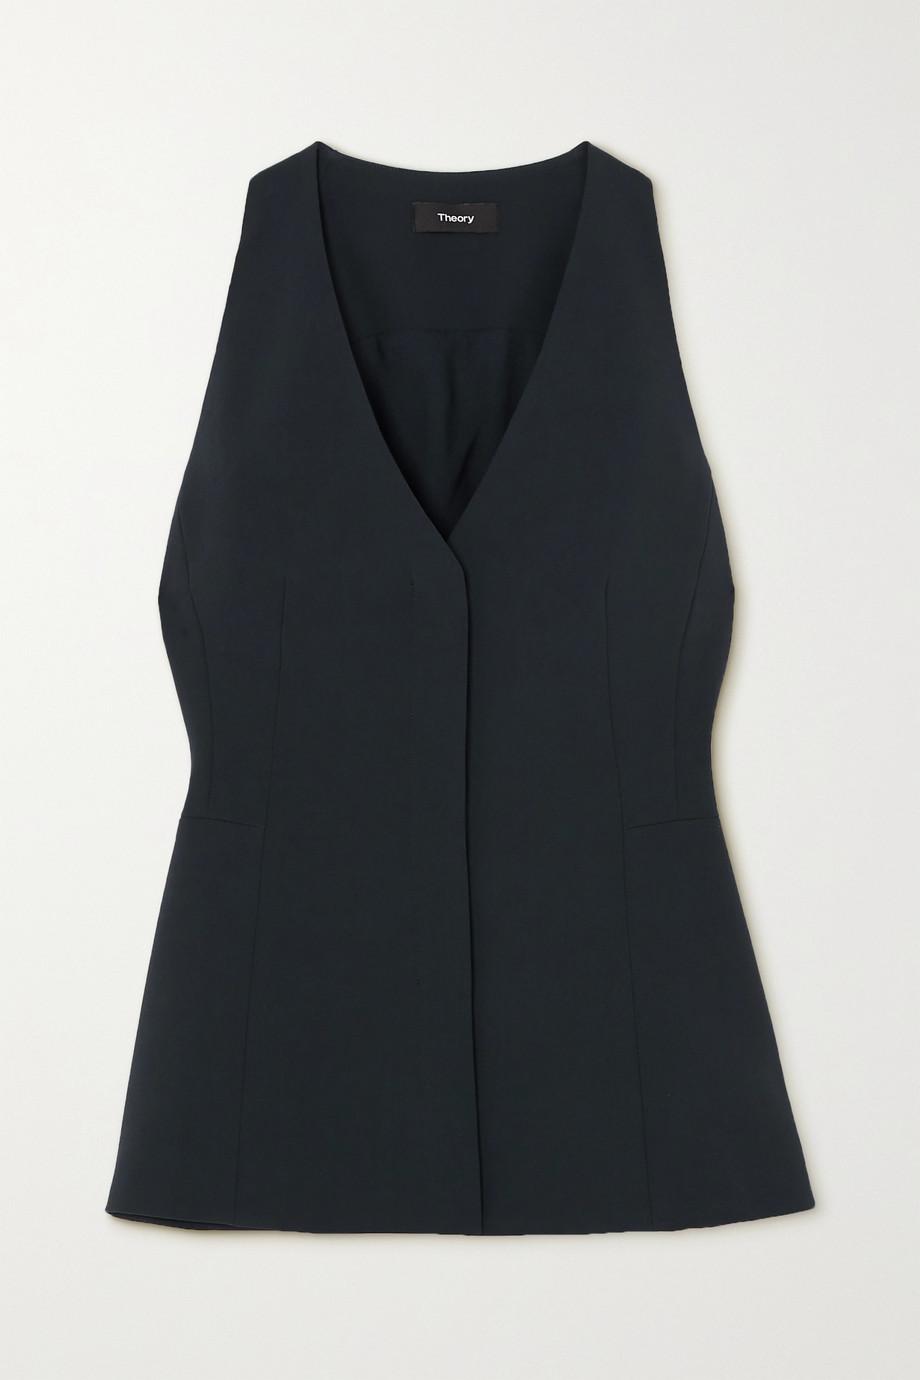 Theory Crepe vest